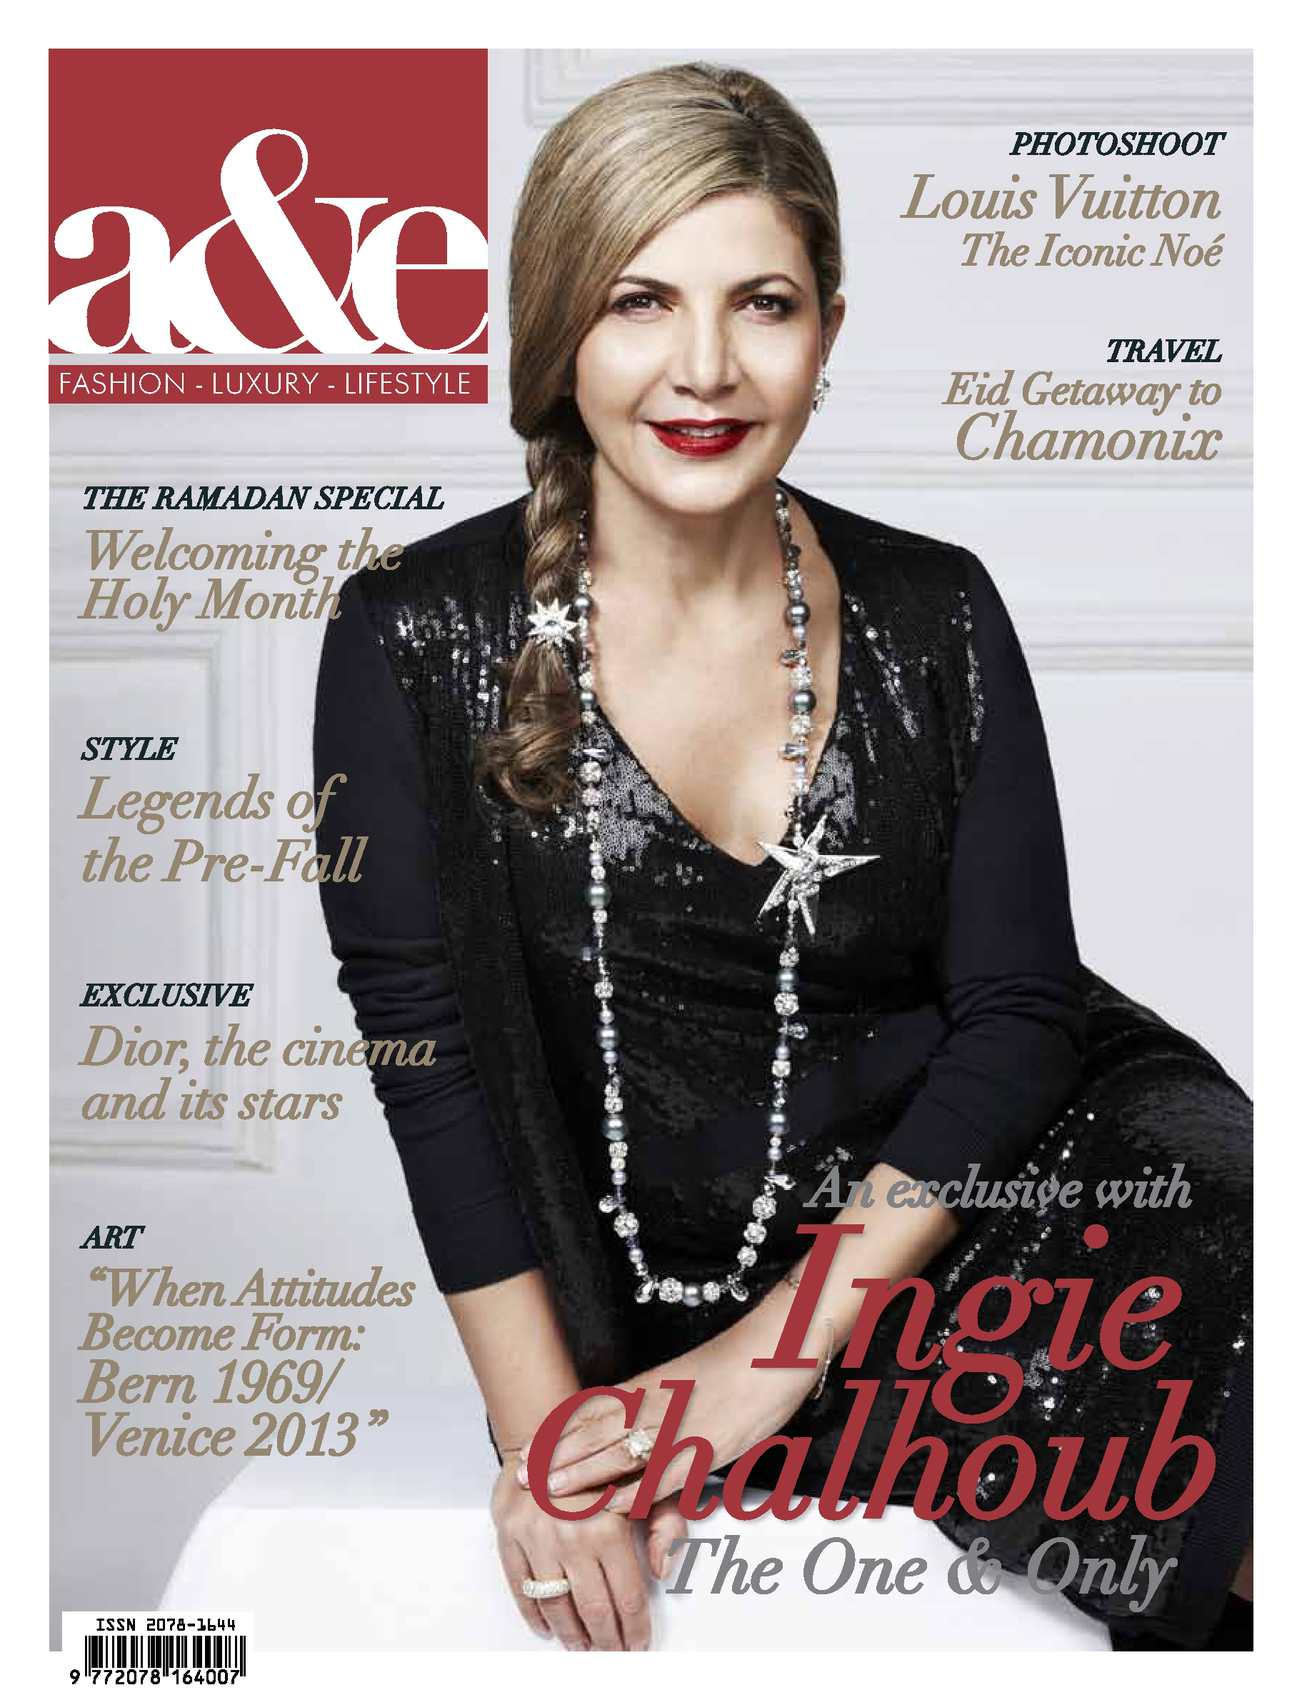 5c3c35507d3c Calaméo - A&E (Adam&Eve) Magazine Kuwait Issue 06